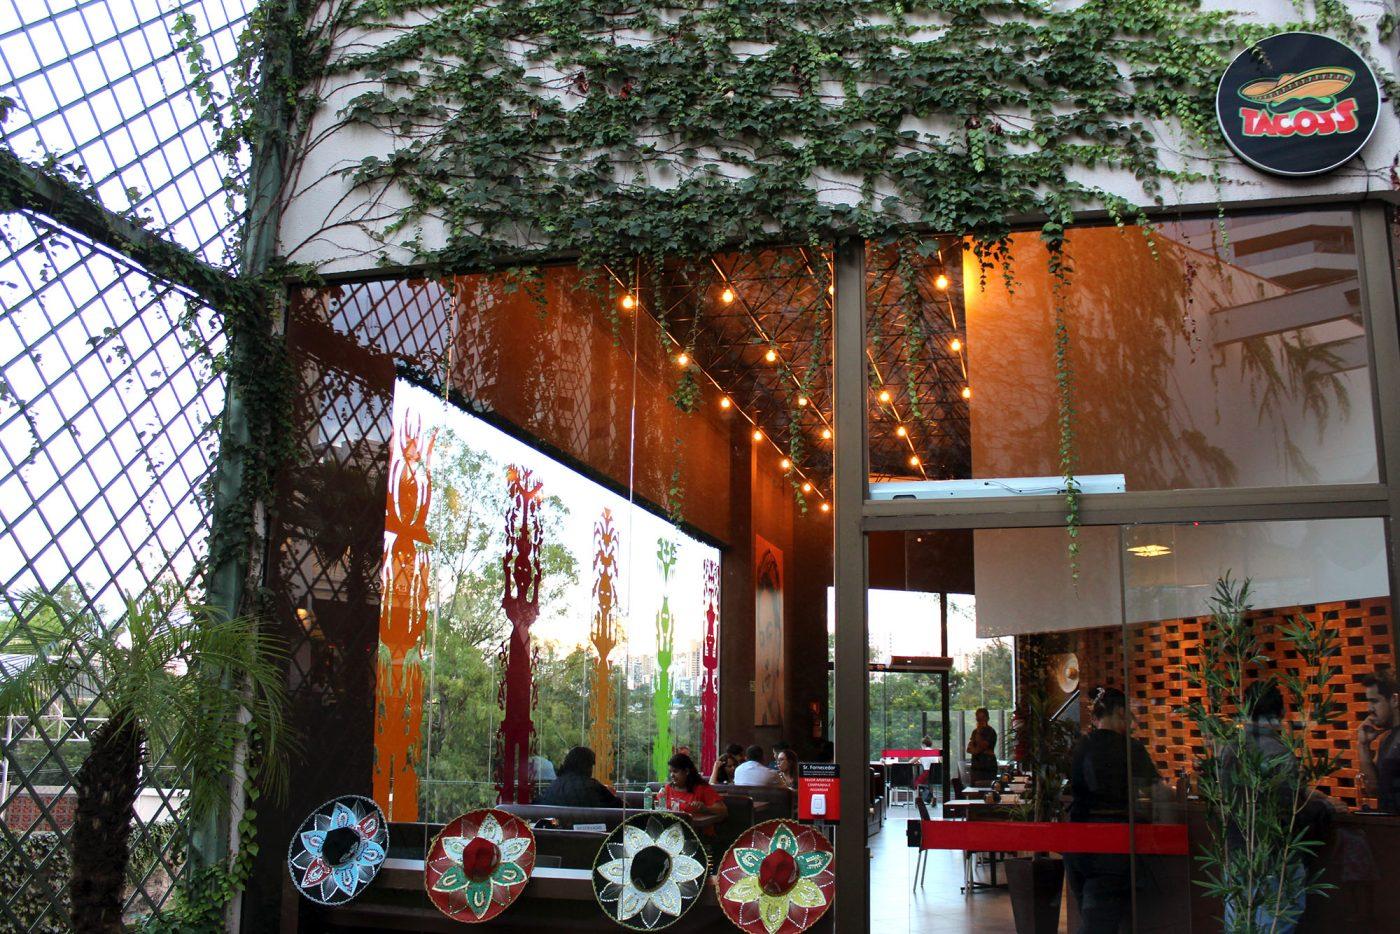 fachada restaurante tacos tacoss mexicano londrina